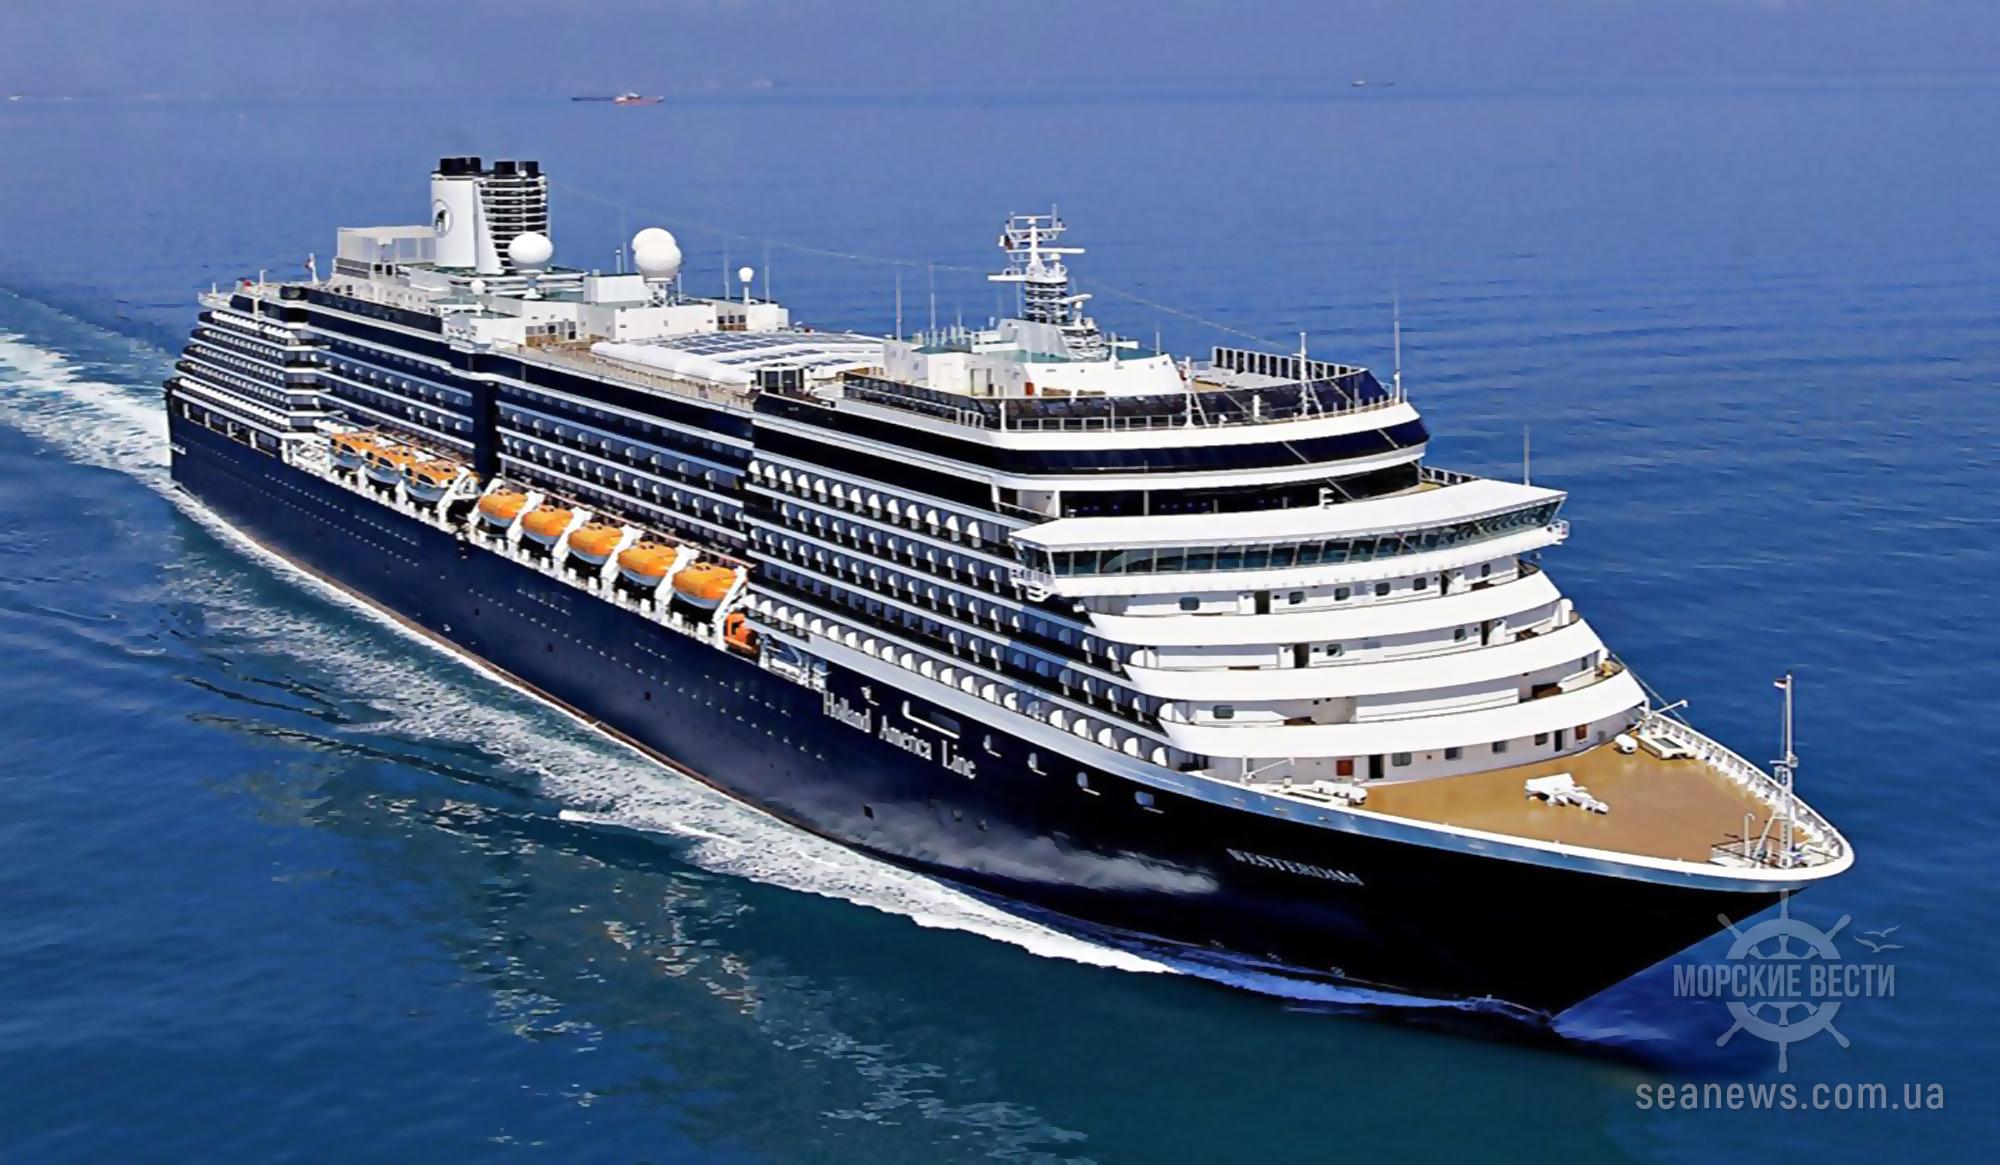 Власти Малайзии запретили въезд пассажирам круизного судна Westerdam